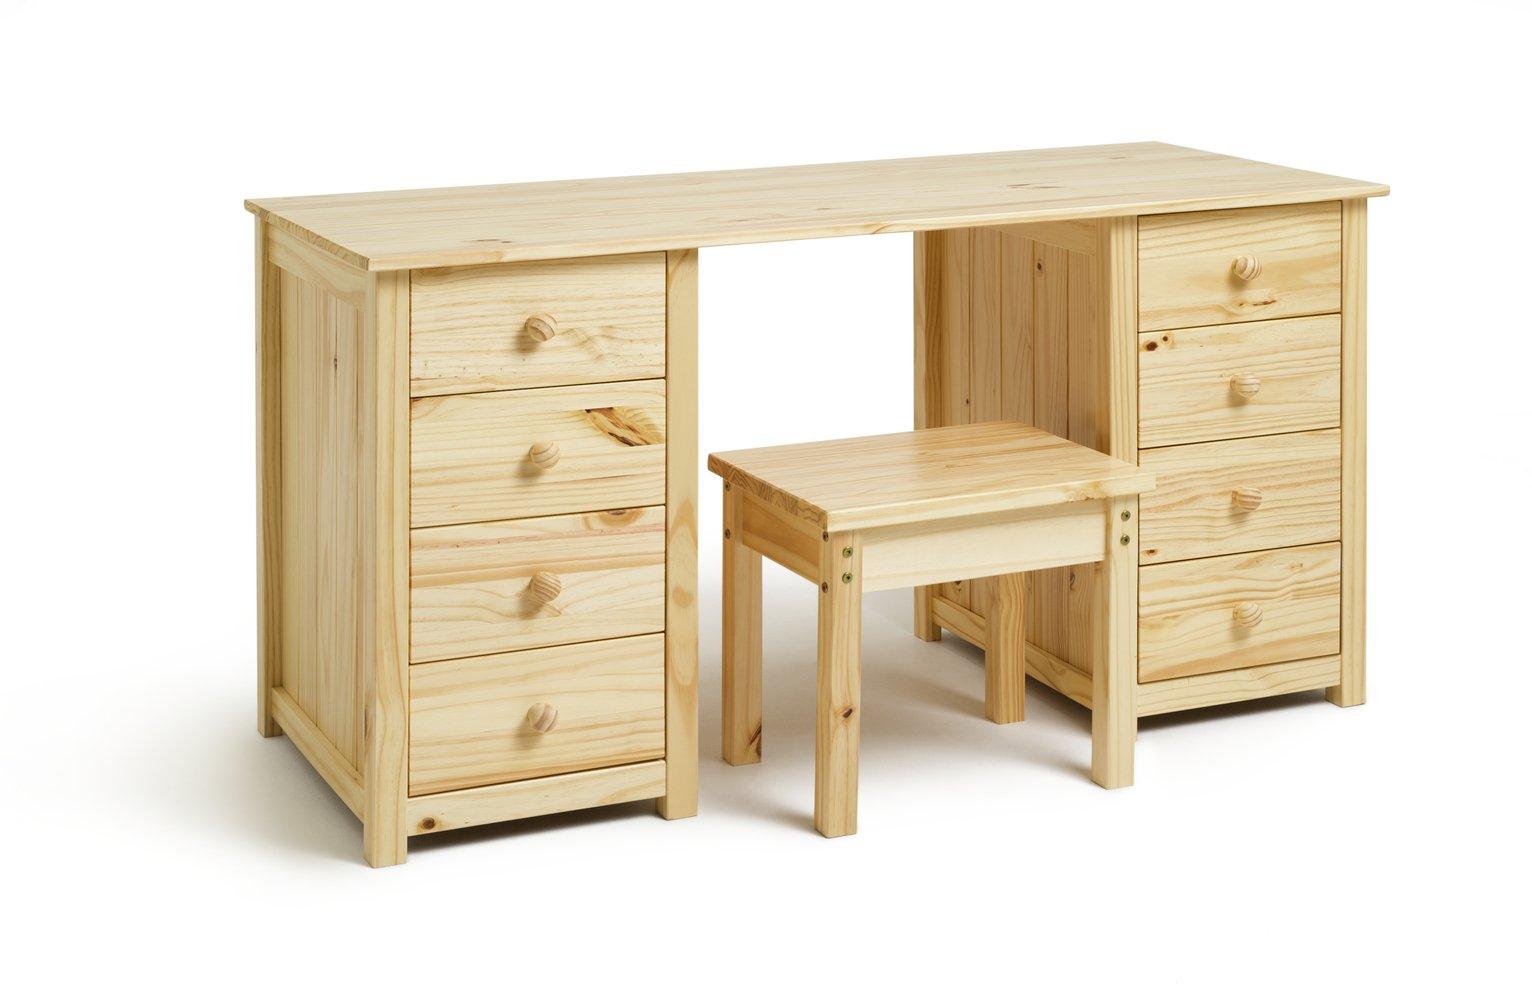 Argos Home Scandinavia 8 Drw Dressing Table and Stool - Pine